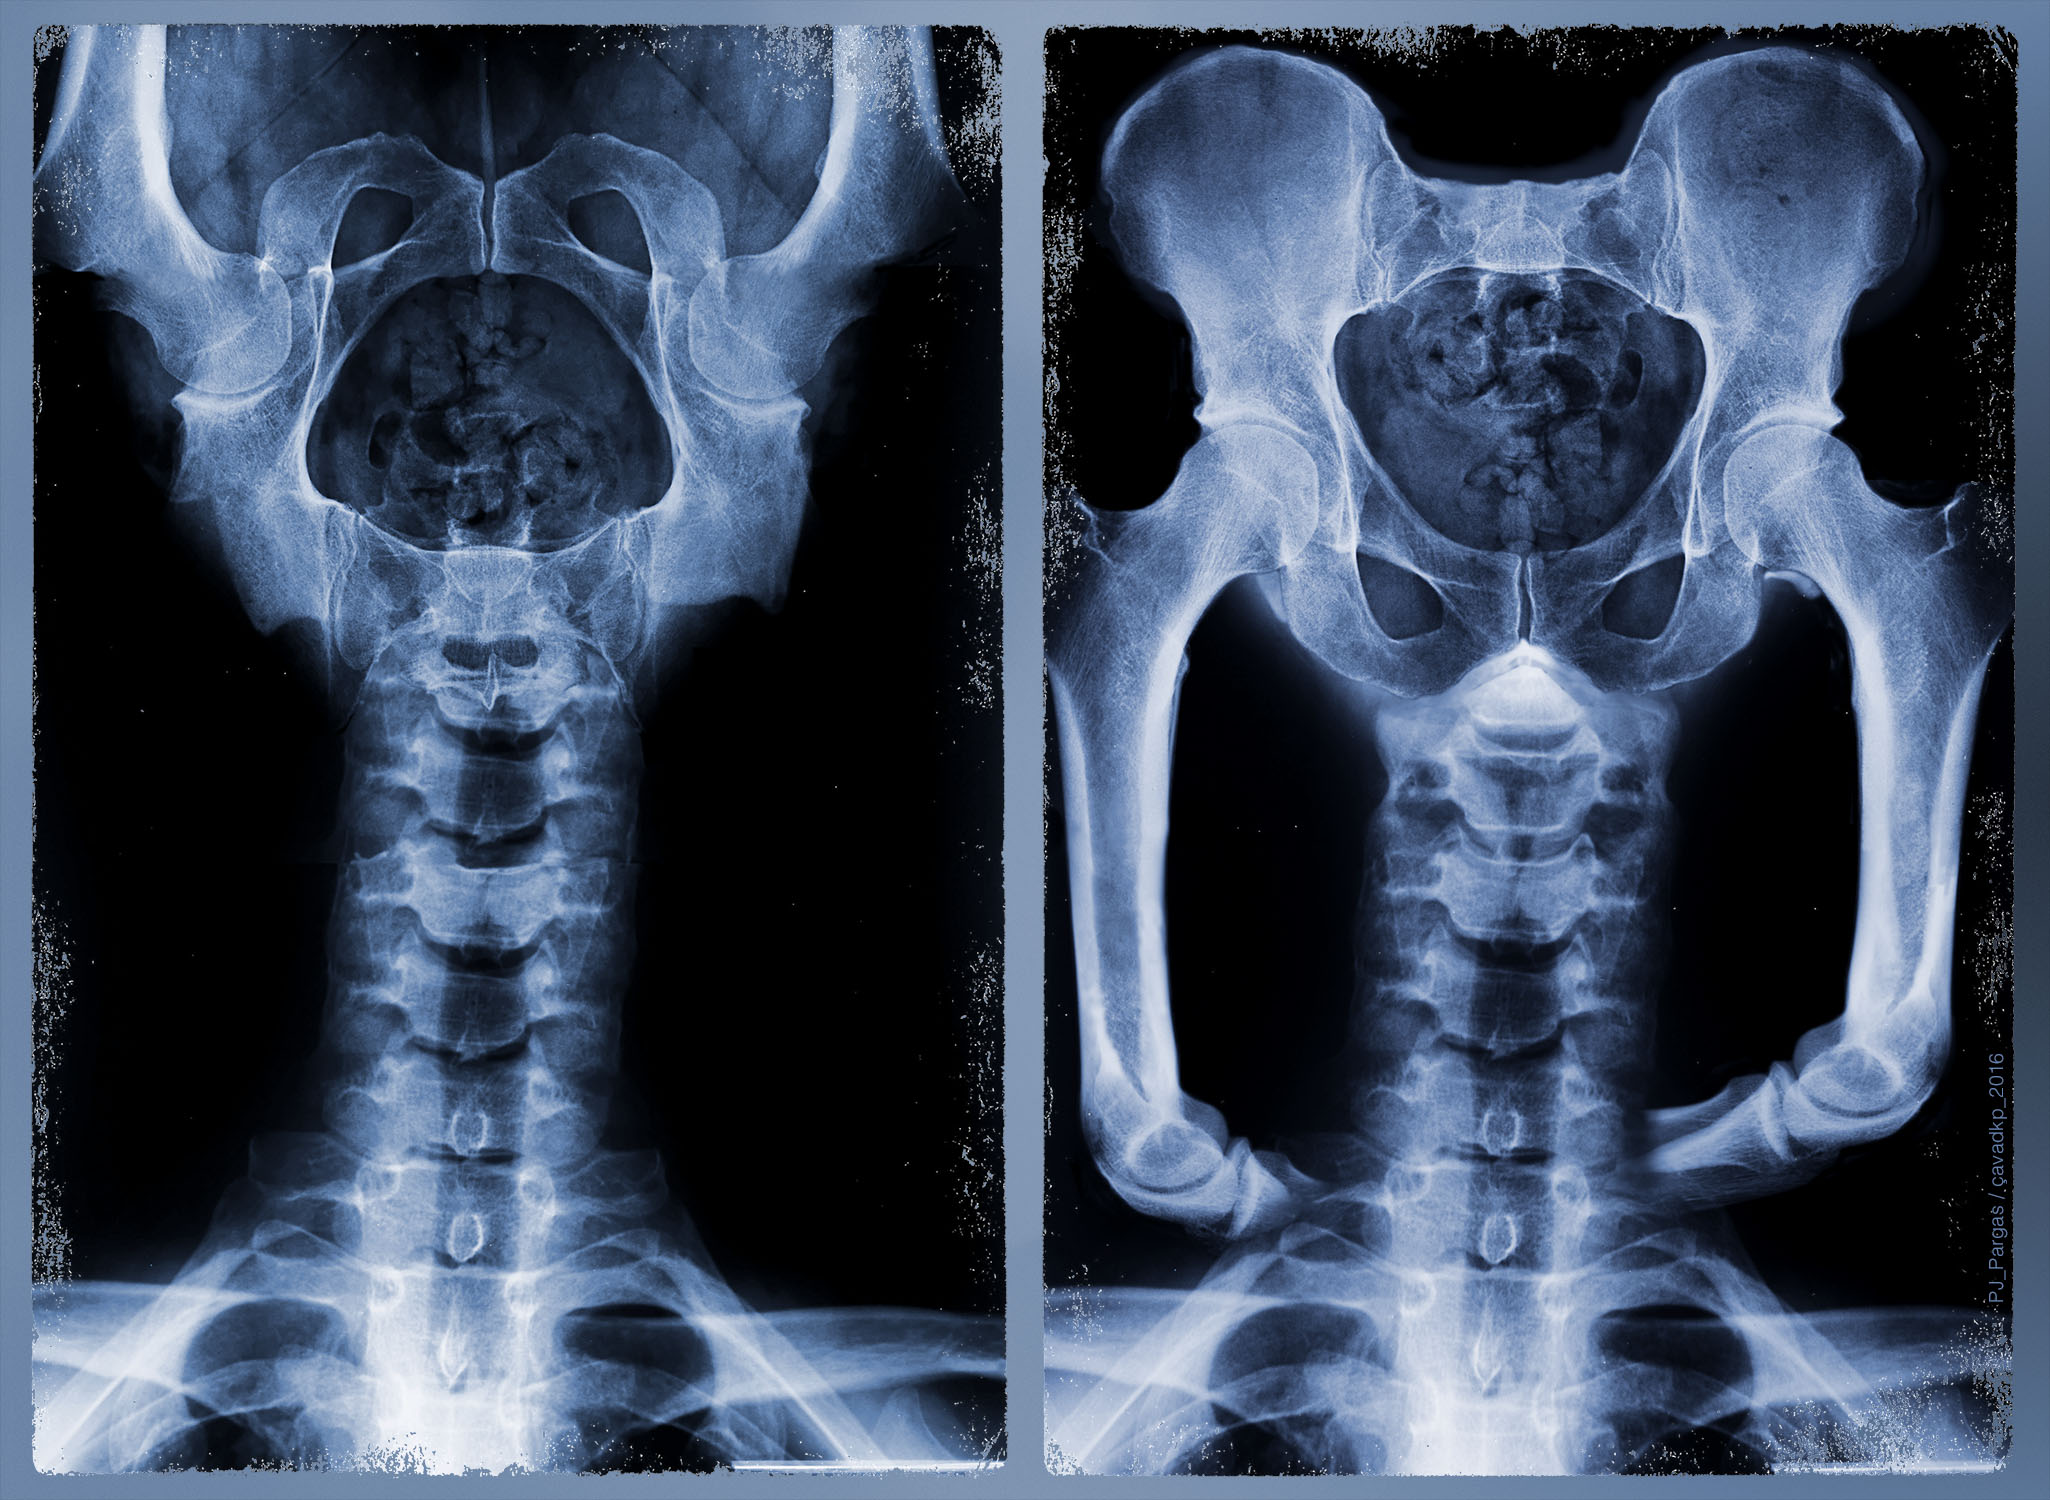 SkeletonExperience